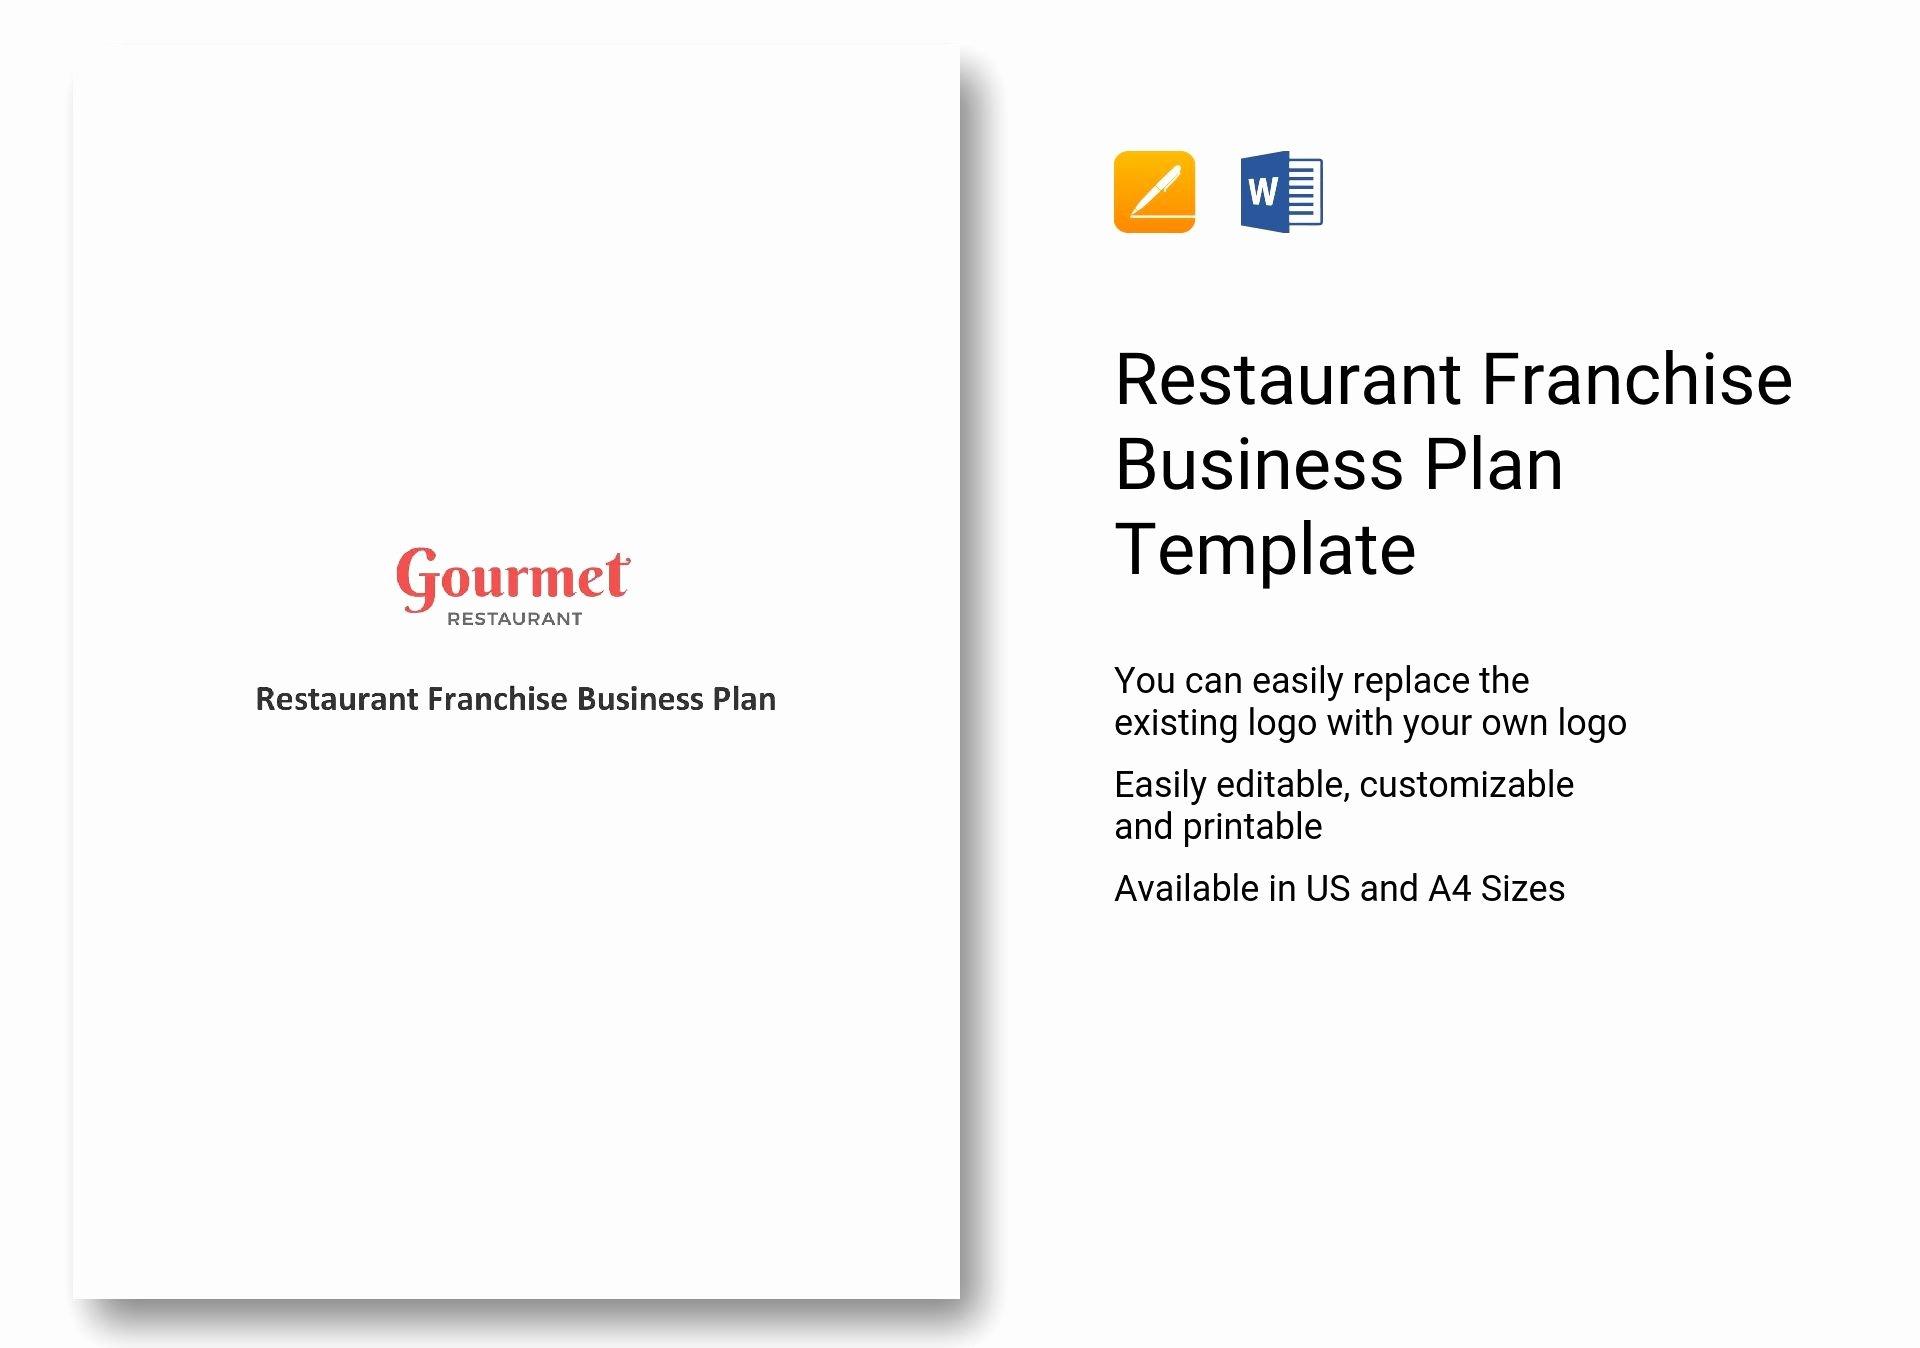 Restaurant Business Plan Template Word Beautiful Restaurant Franchise Business Plan Template In Word Apple